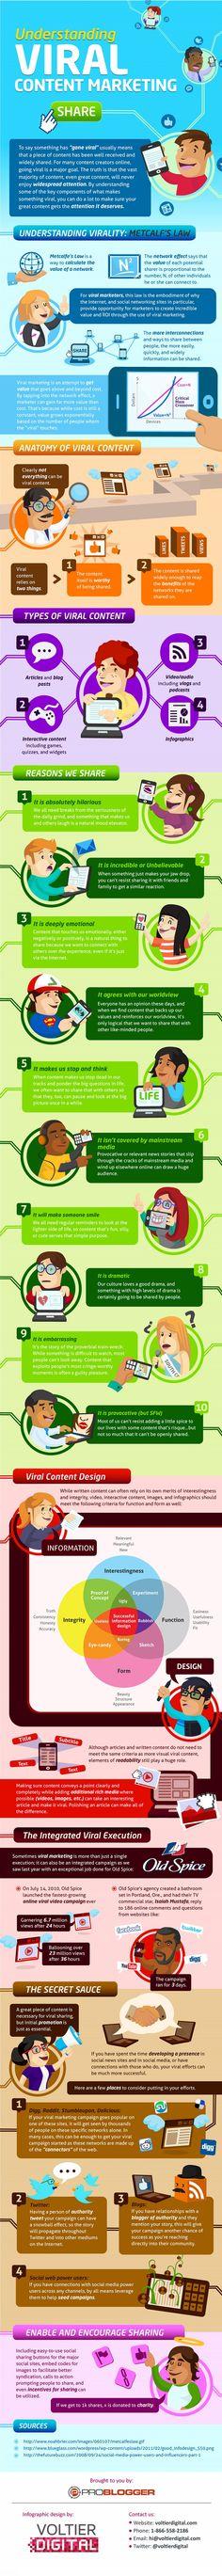 ¿Cómo Crear Contenido Viral? [Infografía]   Blog Marketing